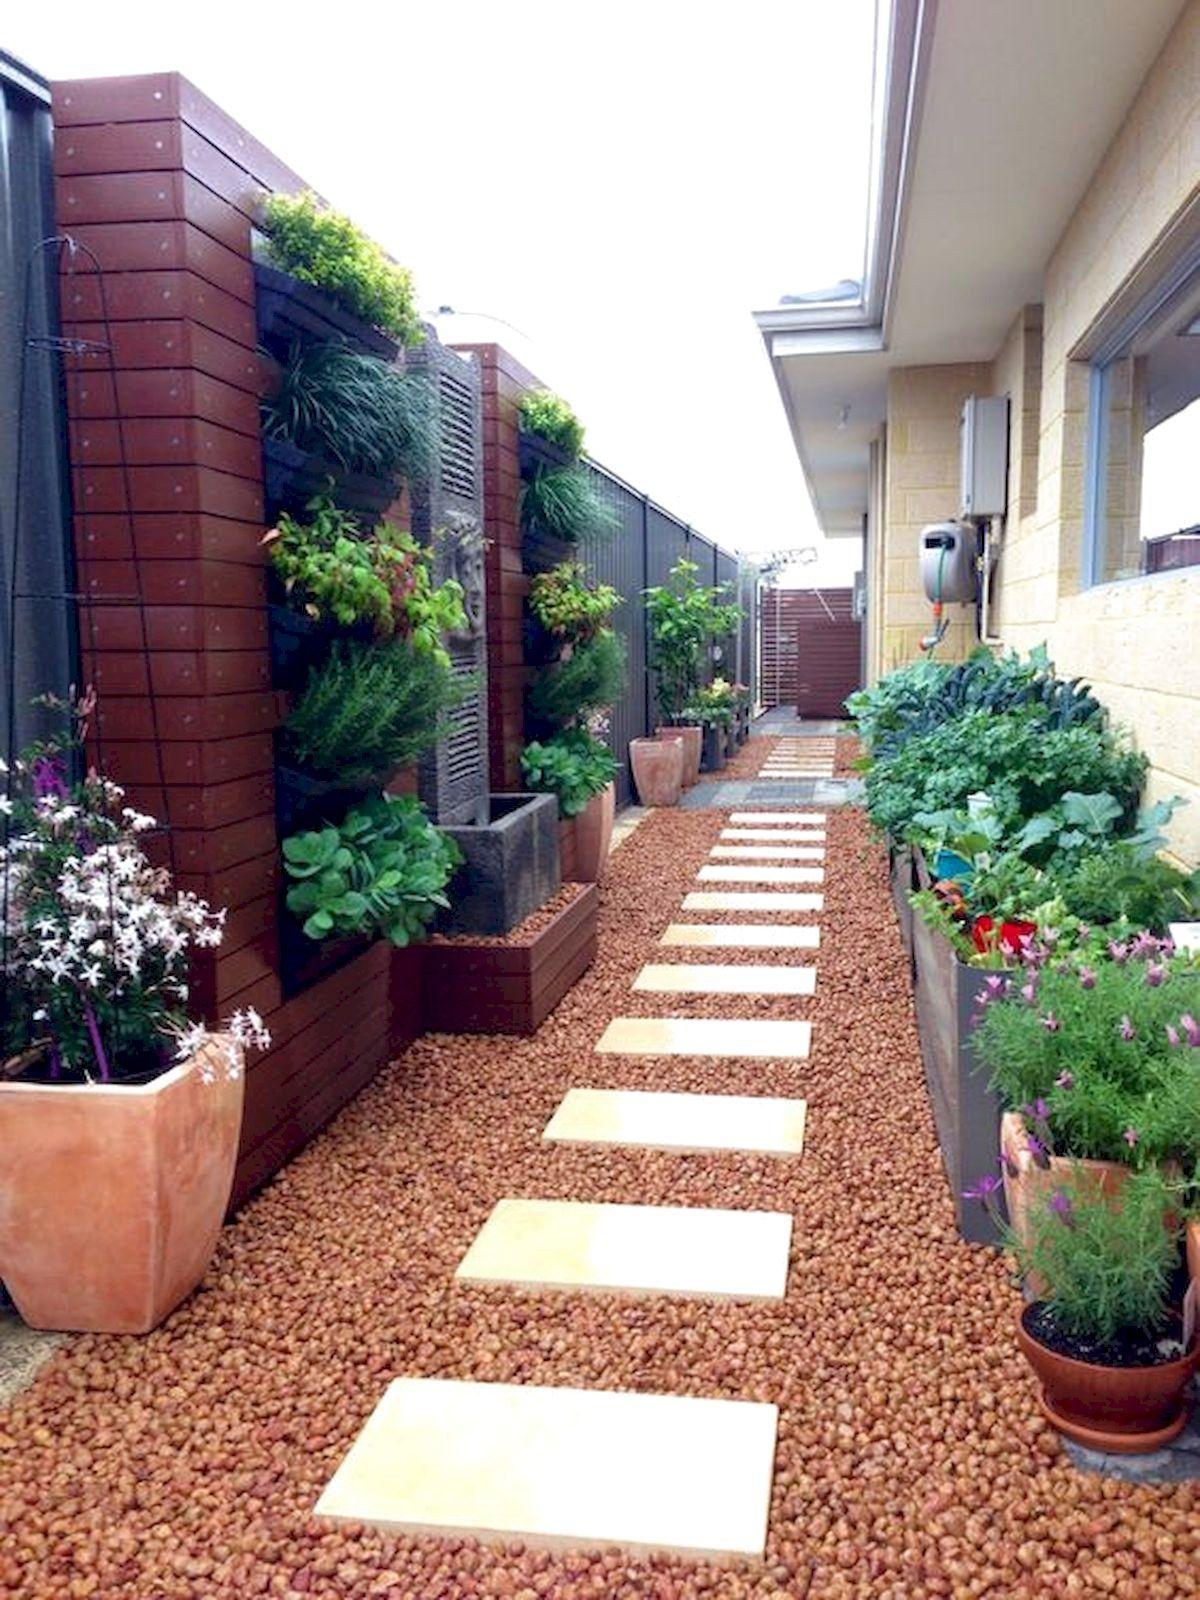 Home Garden Design Ideas: 40 INSANELY SIDE YARD GARDEN DESIGN IDEAS AND REMODEL